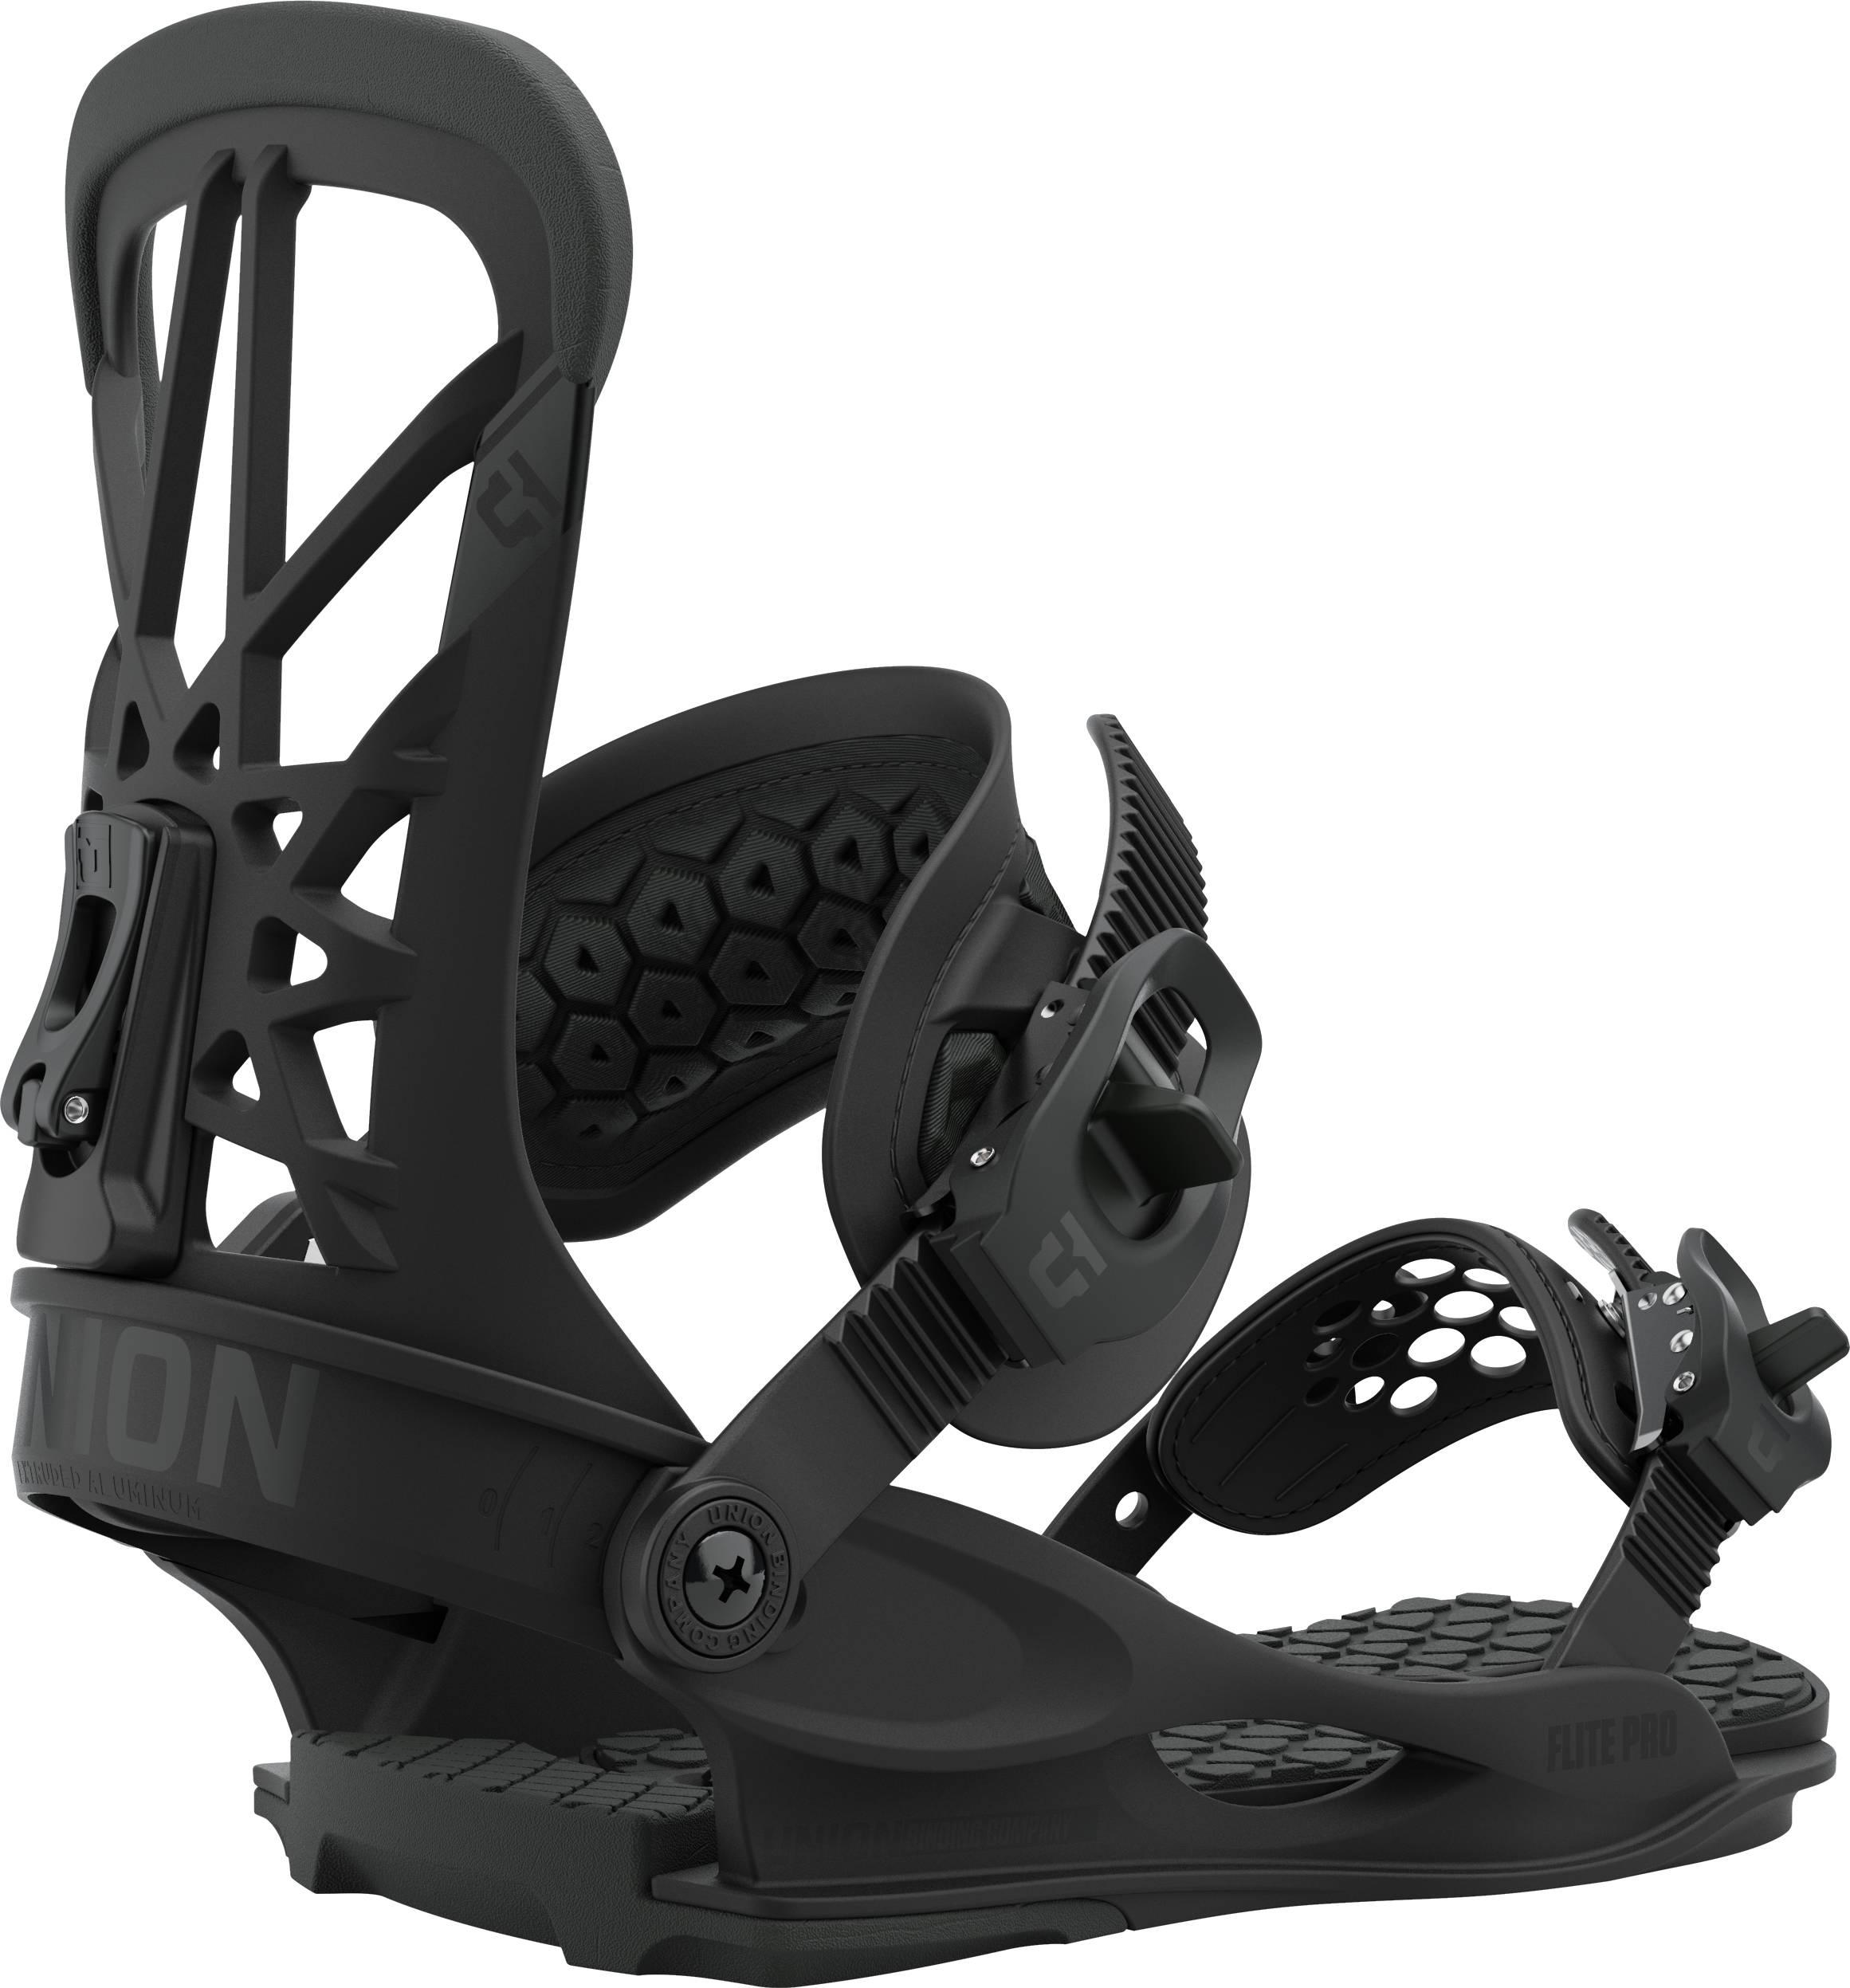 Union Flite Pro Snowboard Bindings, M Black 2021